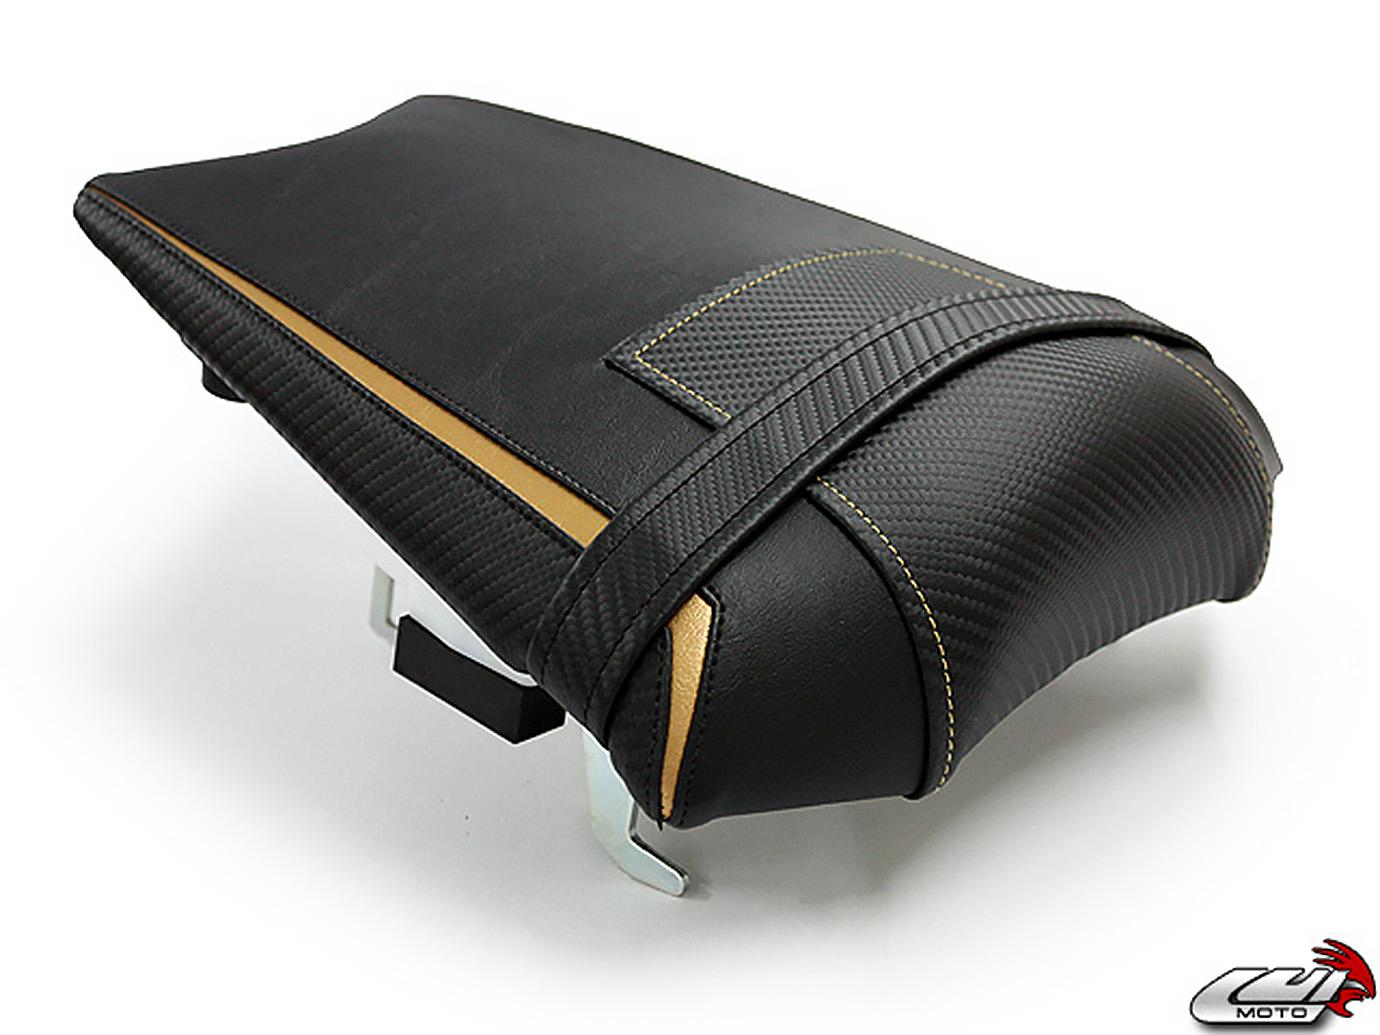 YAMAHA FZ8 FAZER 8 10-14 LUIMOTO 製タンデムシートカバー (Sport 5111201)